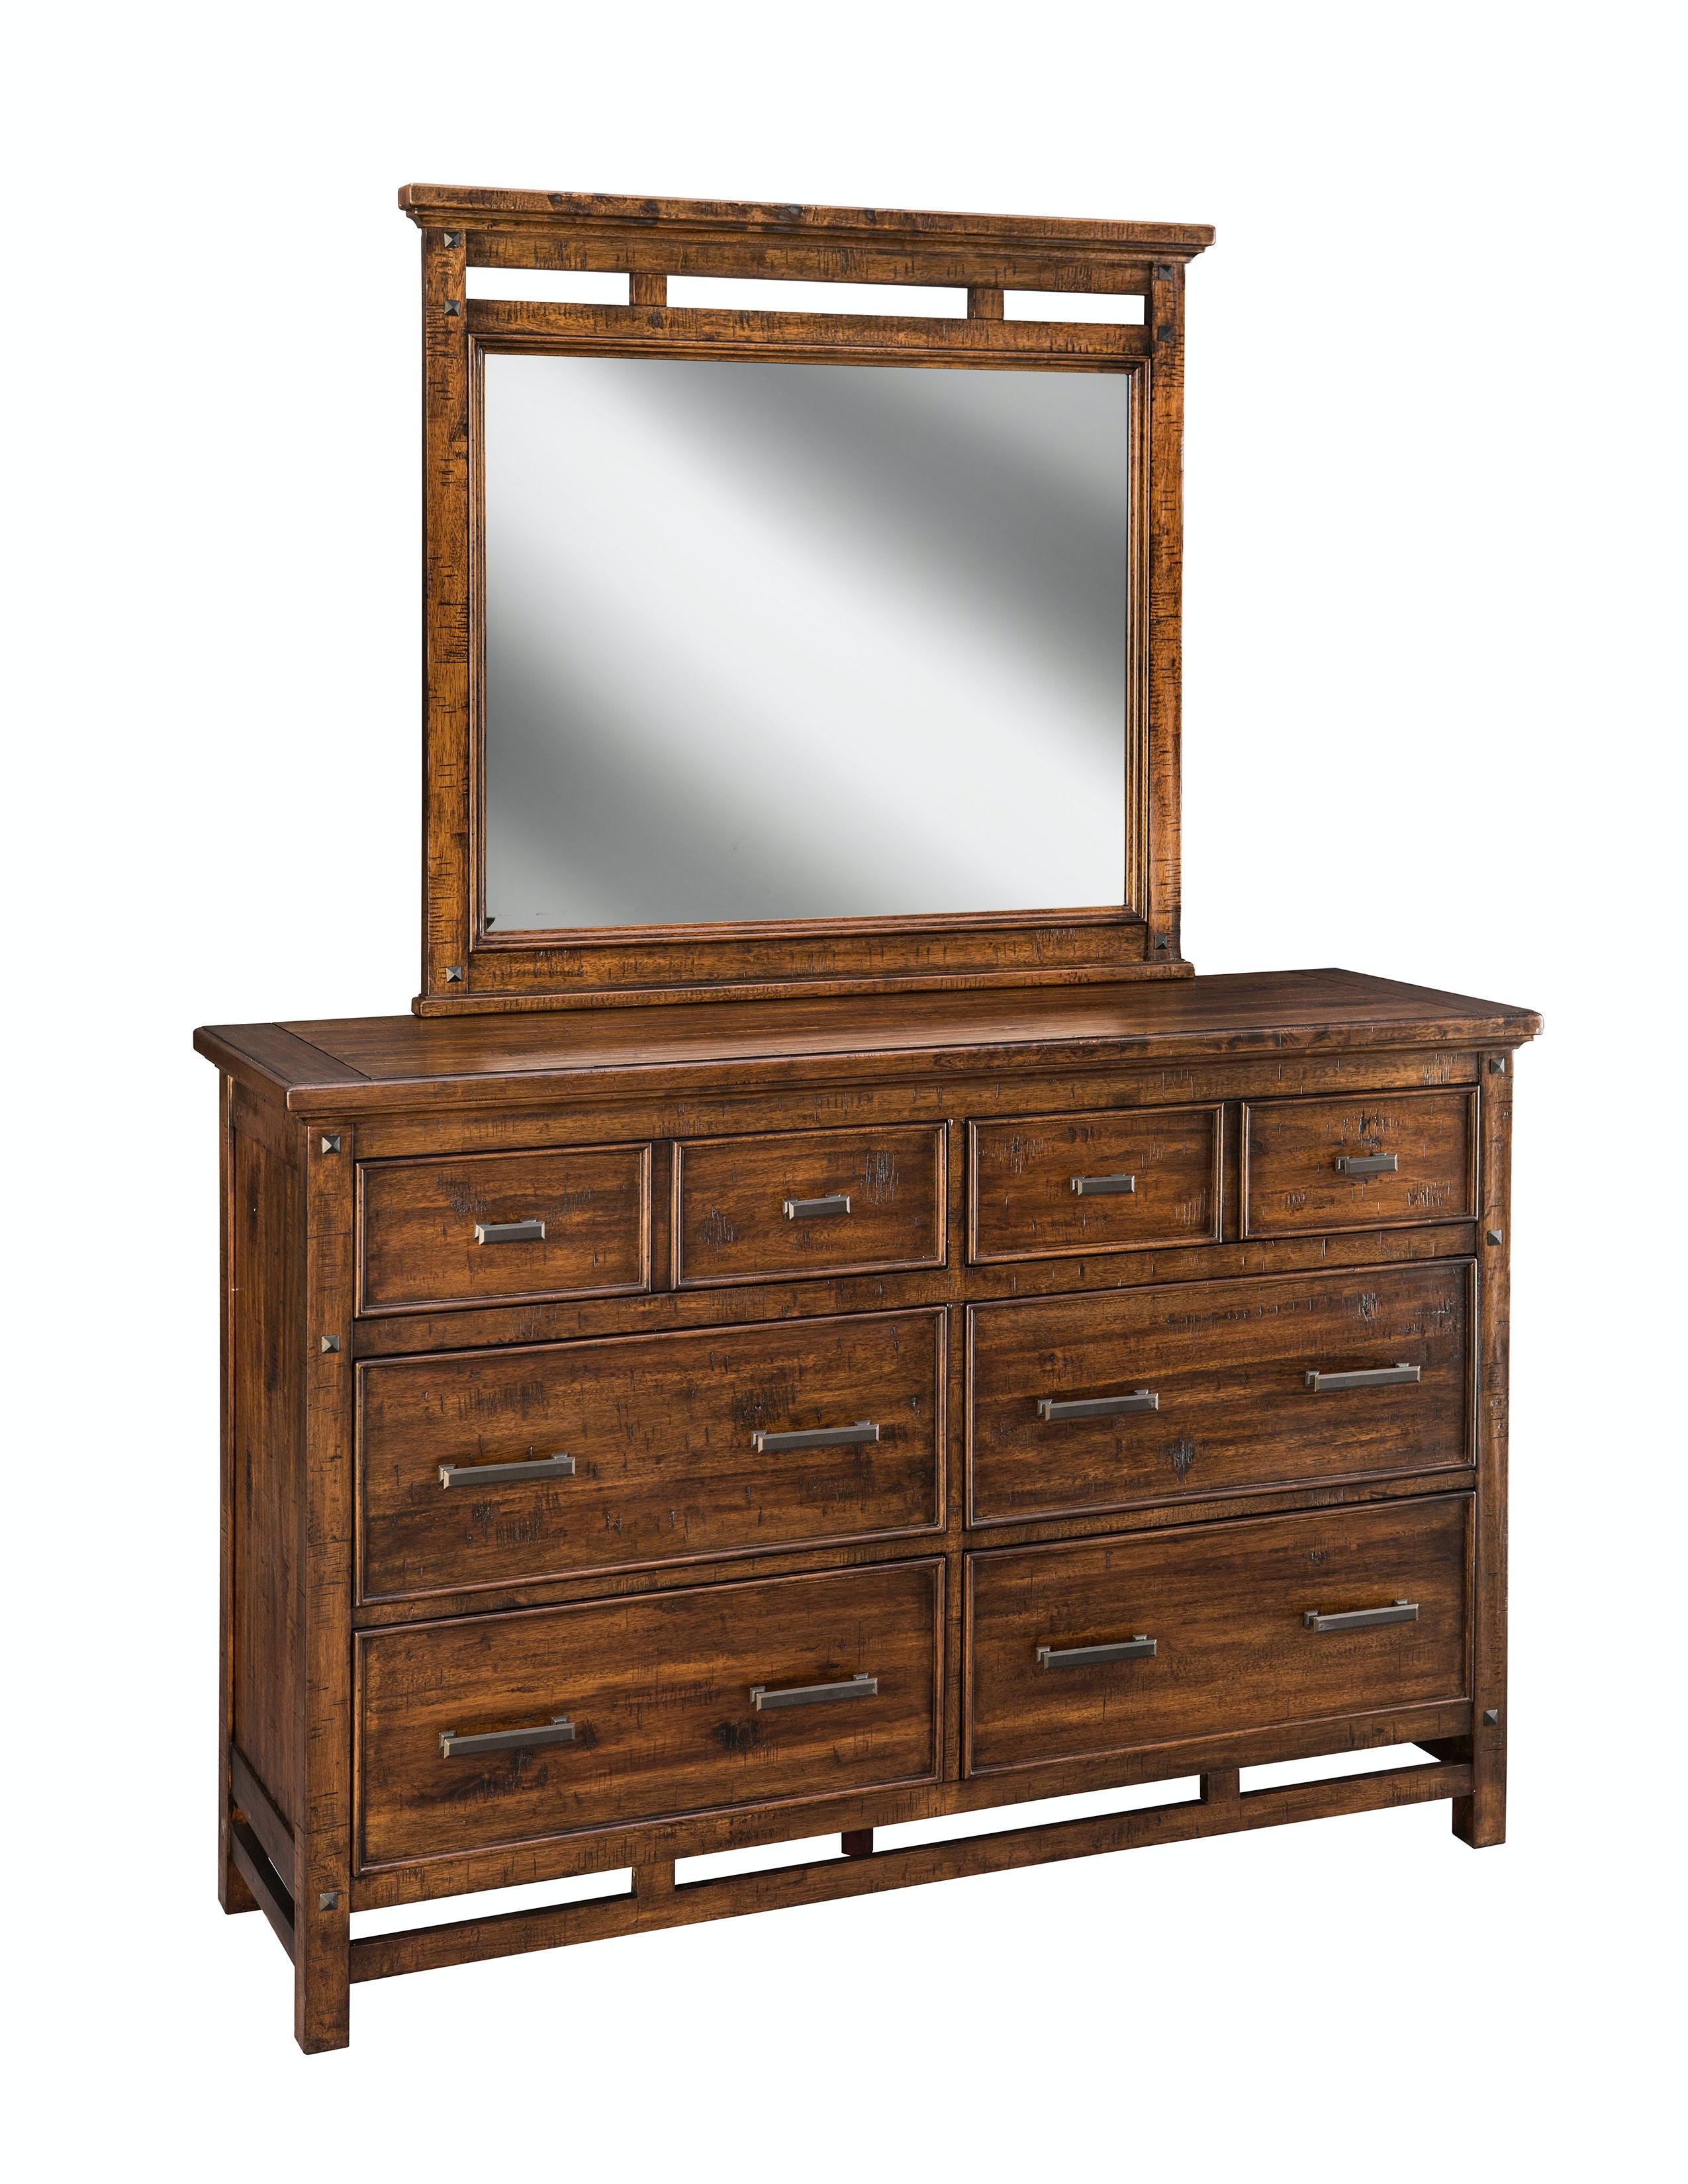 Attractive Intercon Wolf Creek Six Drawer Dresser WK BR 6106 VAC C Design Inspirations